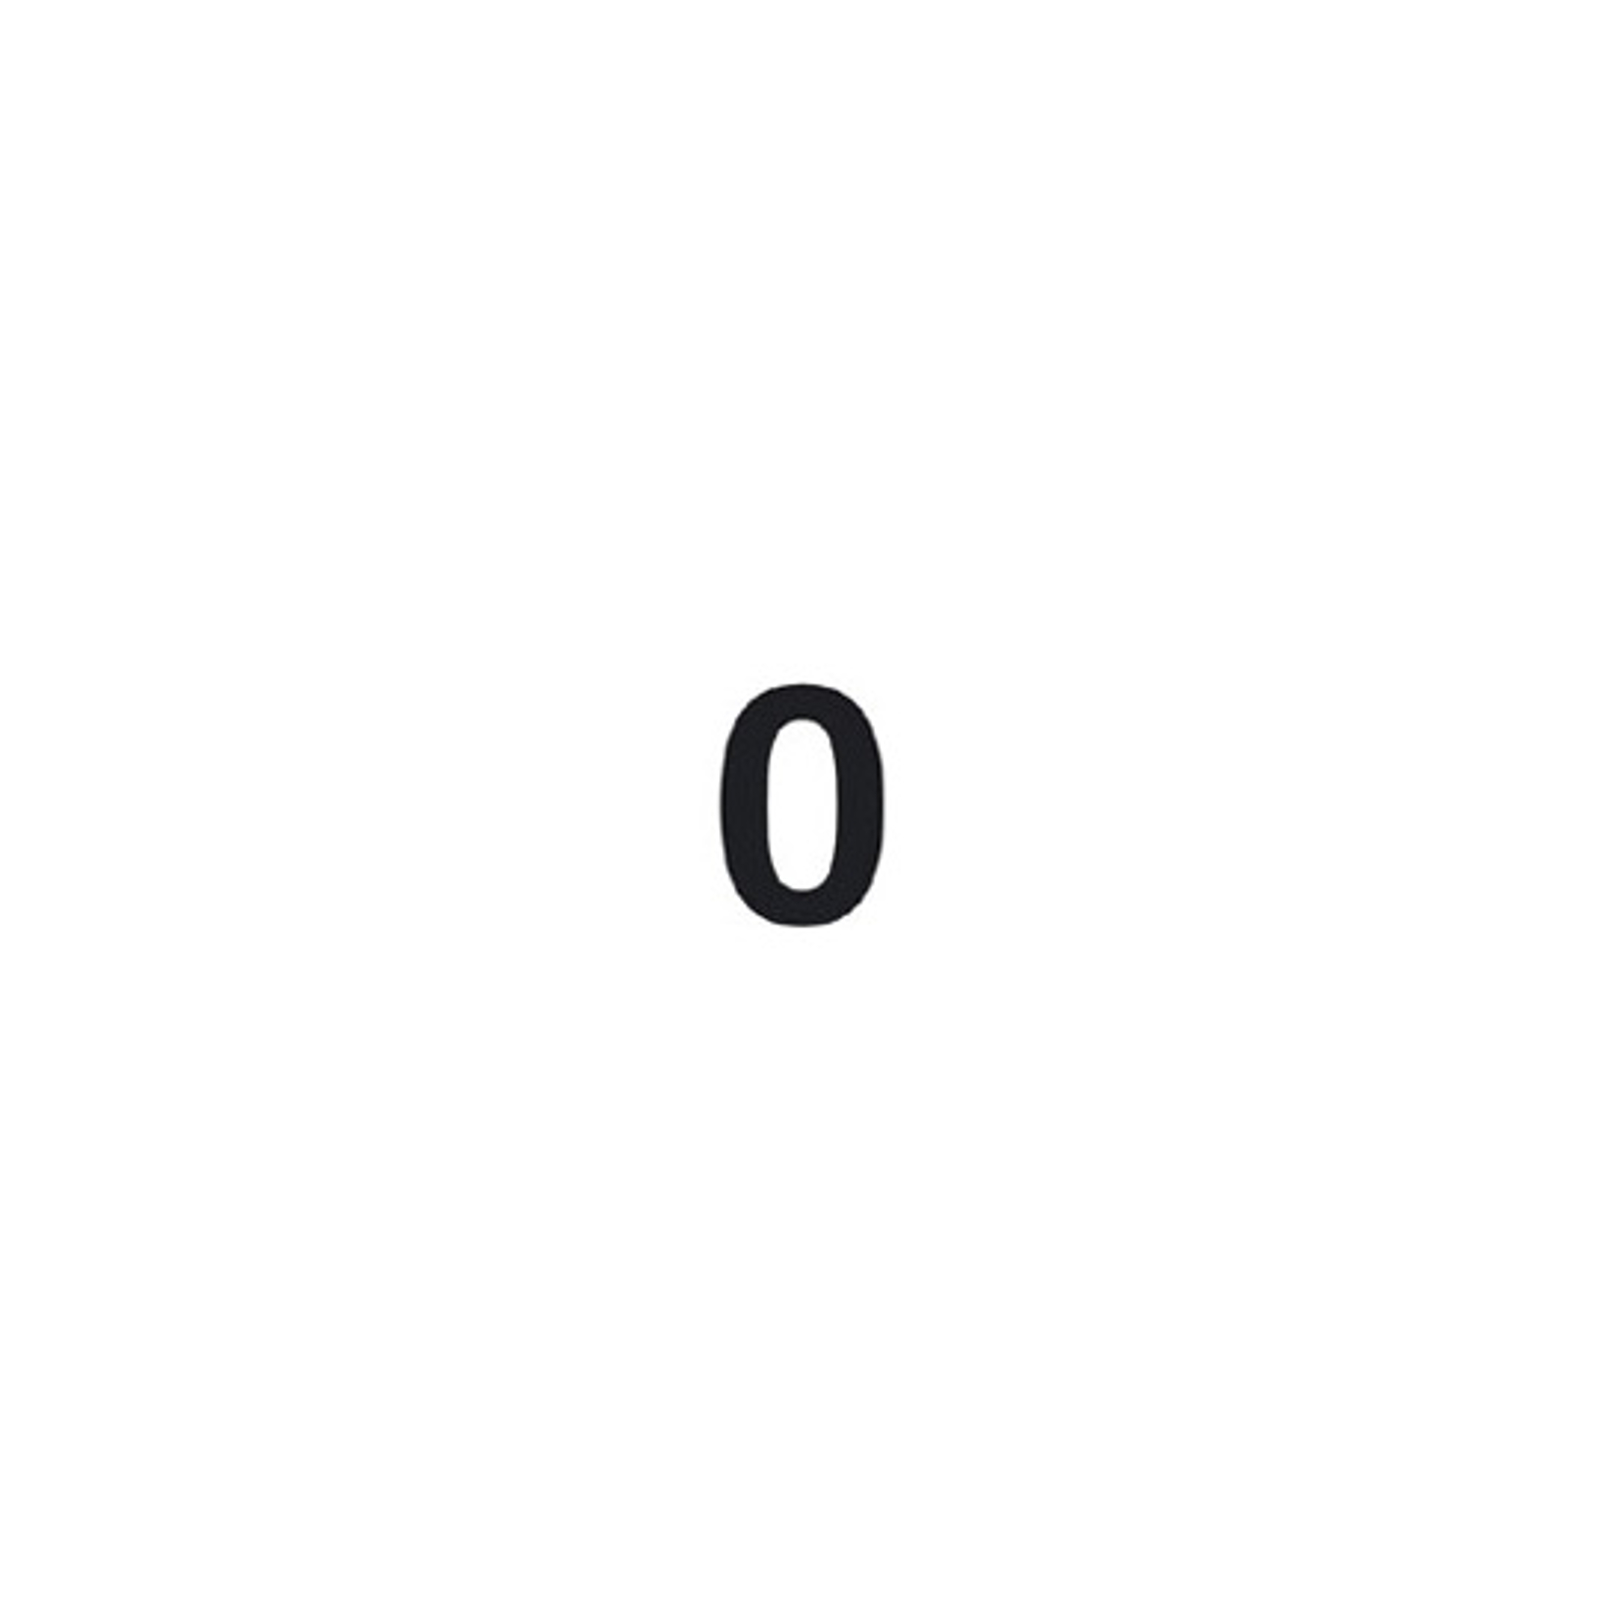 Selvklebende tallet 0